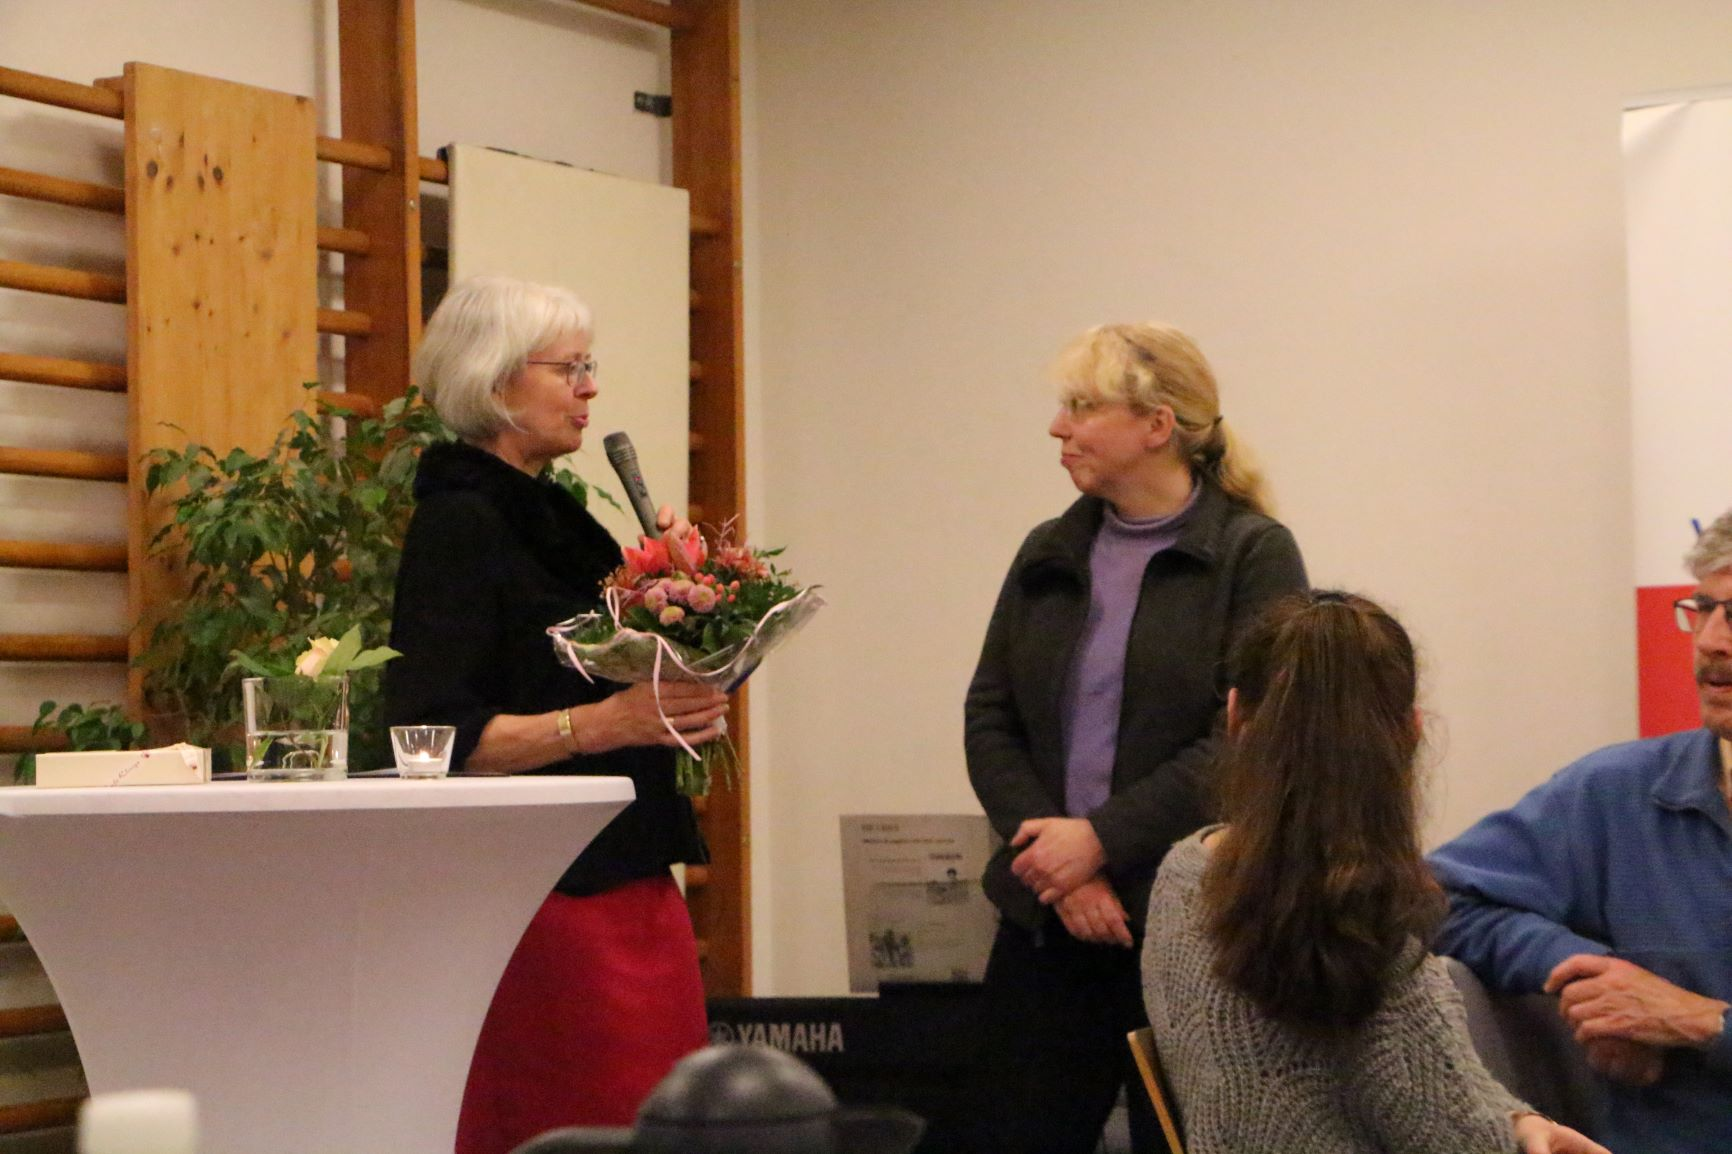 Kreispfarrerin Ulrike Hoffmann und Frau Insa Meier